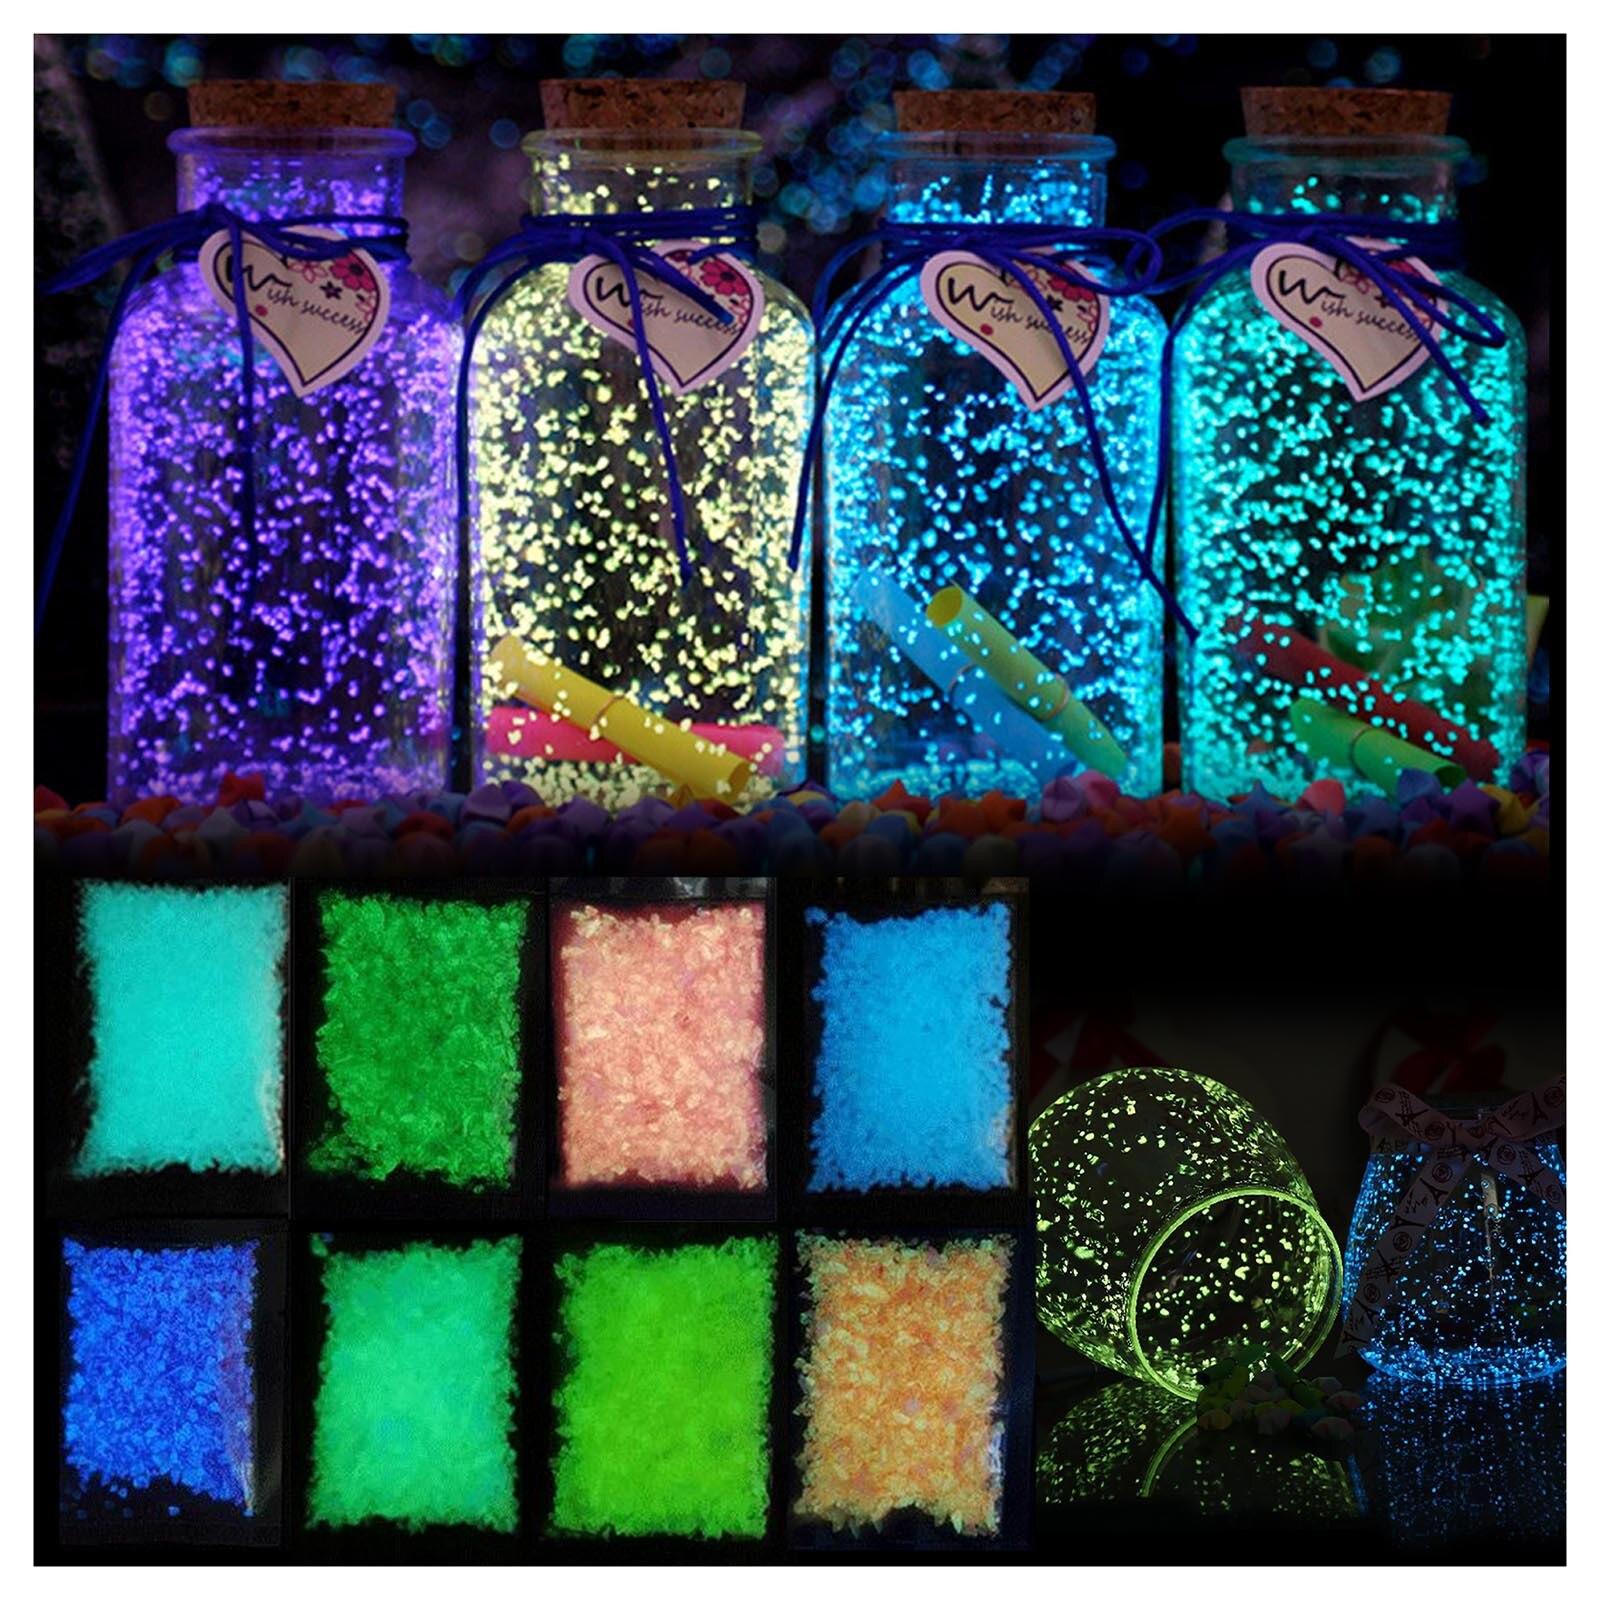 Mini Luminous Sand Stones Garden Park Road Pebbles Glow In Dark Ornaments For Party Aquarium Fish Tank Decoration Stone Ornament